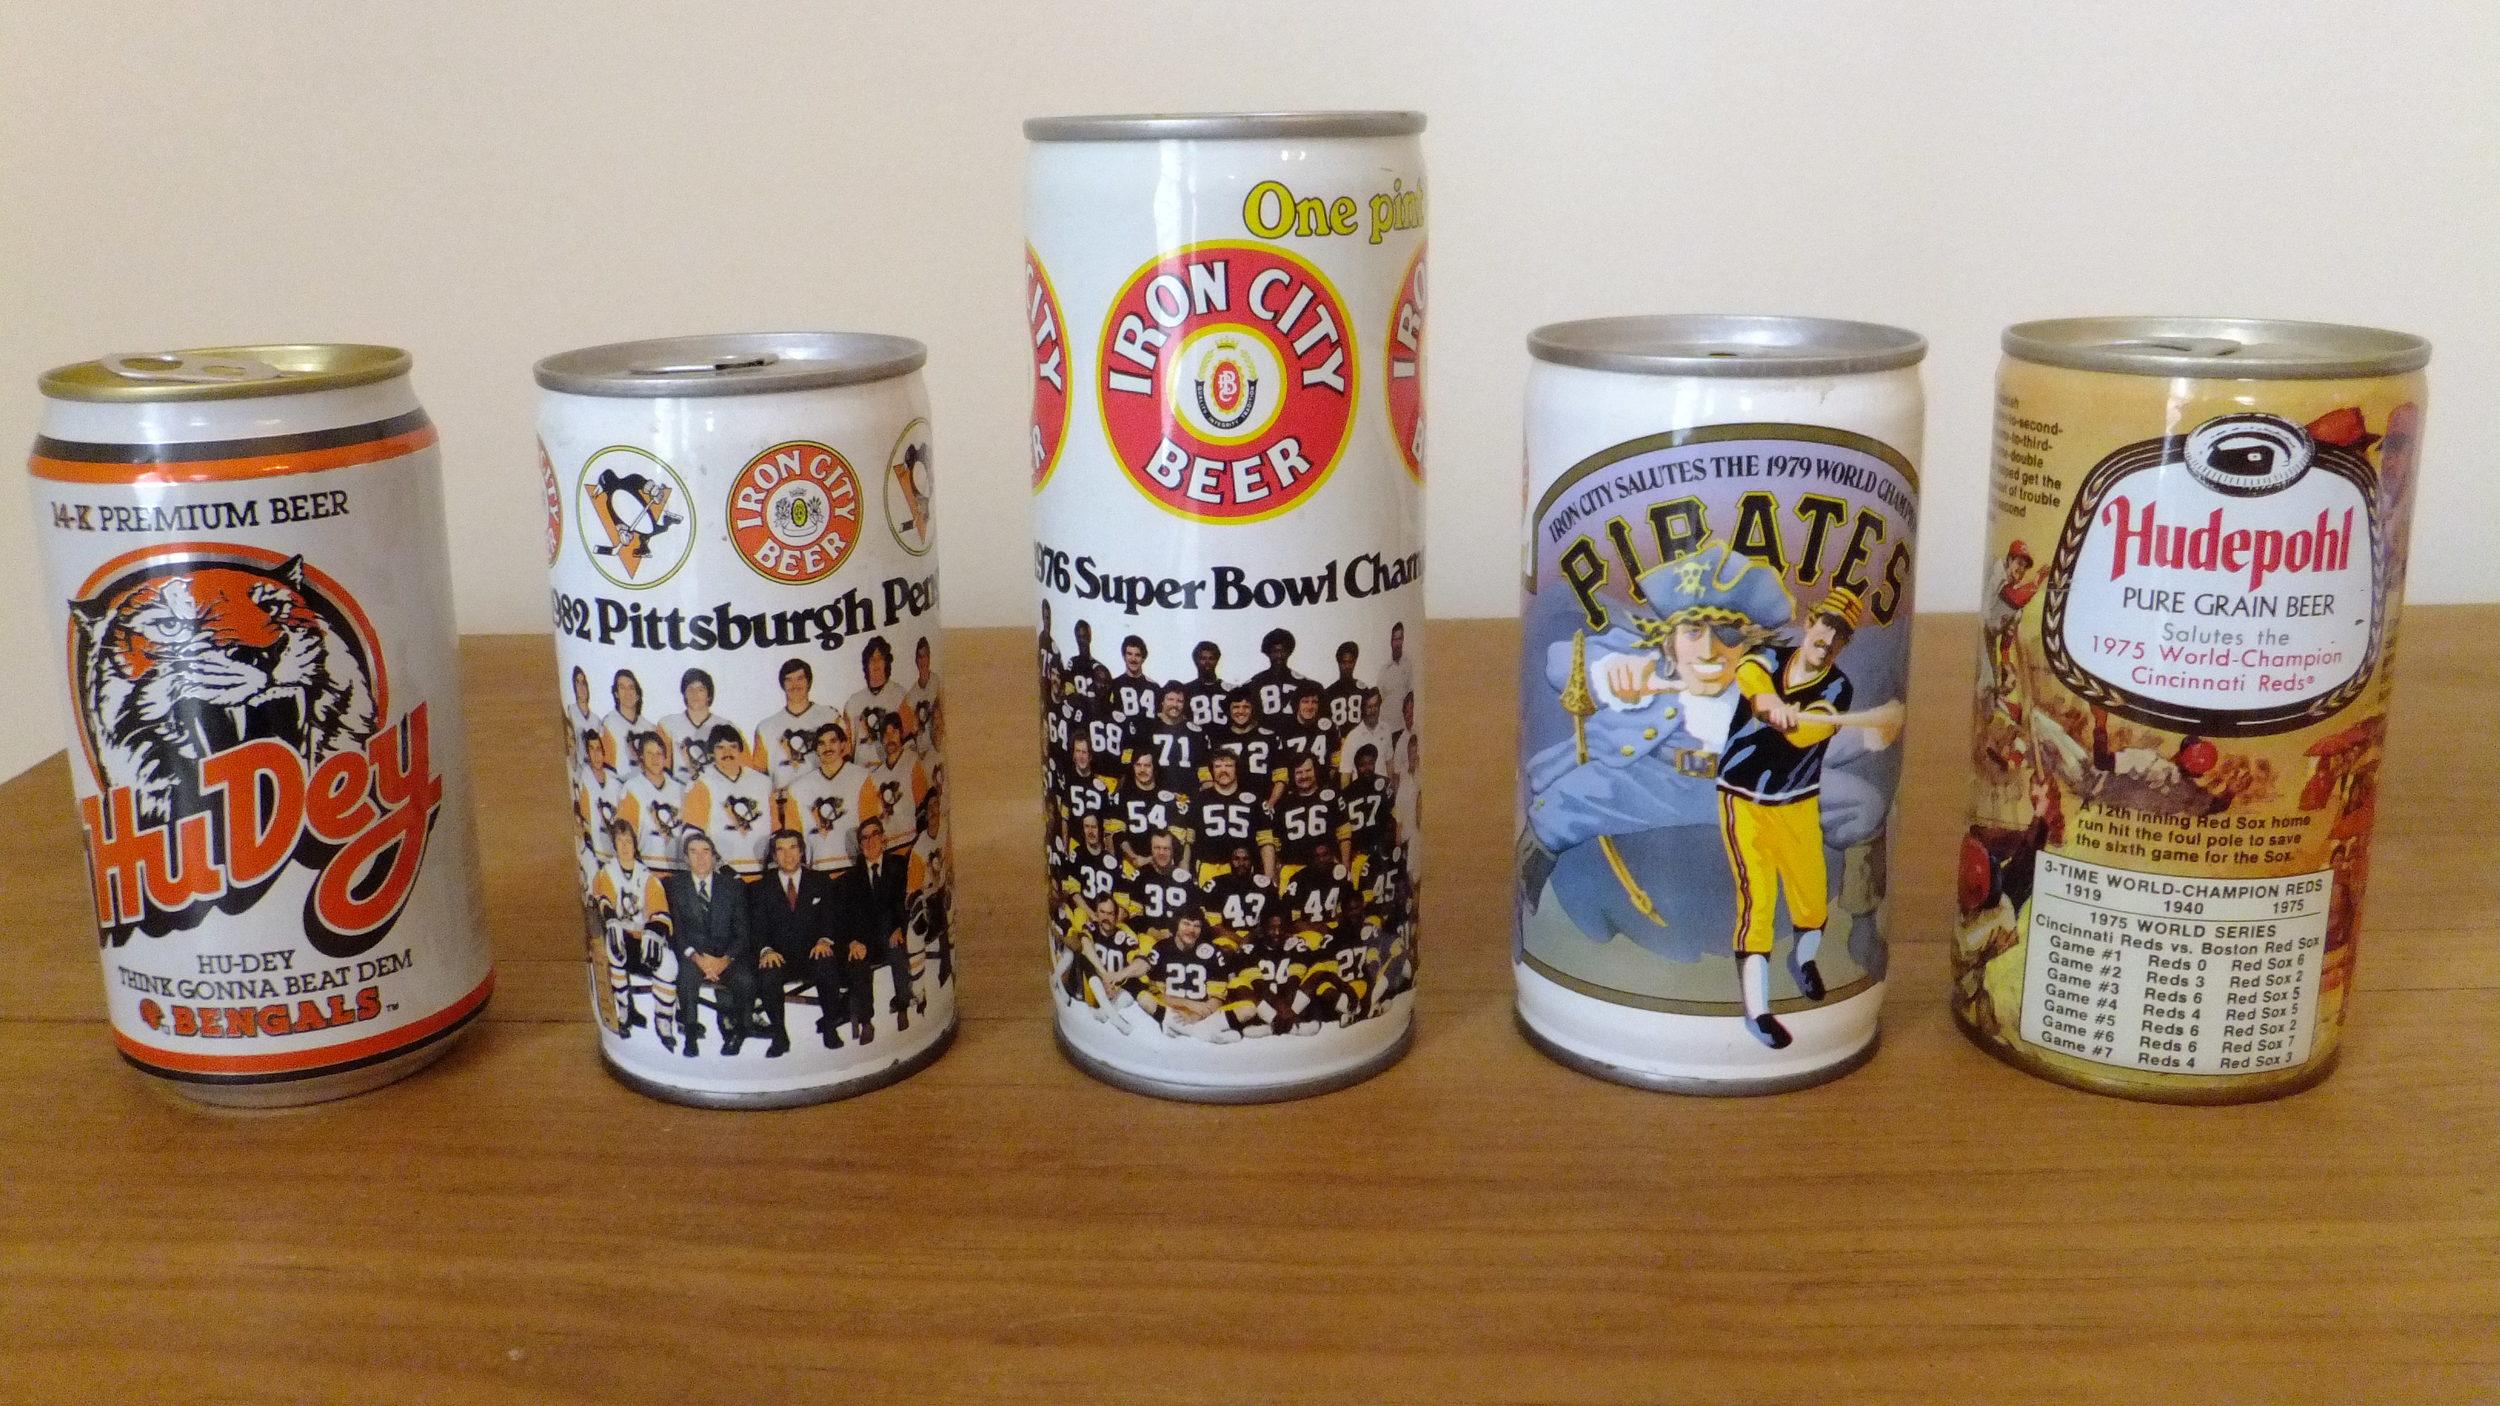 1988 Cincinnati Bengals (Hudepohl-Schoenling Brewing), 1982 Pittsburgh Penguins (Pittsburgh Brewing), 1976 Pittsburgh Steelers (Pittsburgh Brewing), 1979 Pittsburgh Pirates (Pittsburgh Brewing), 1975 Cincinnati Reds (Hudepohl Brewing)